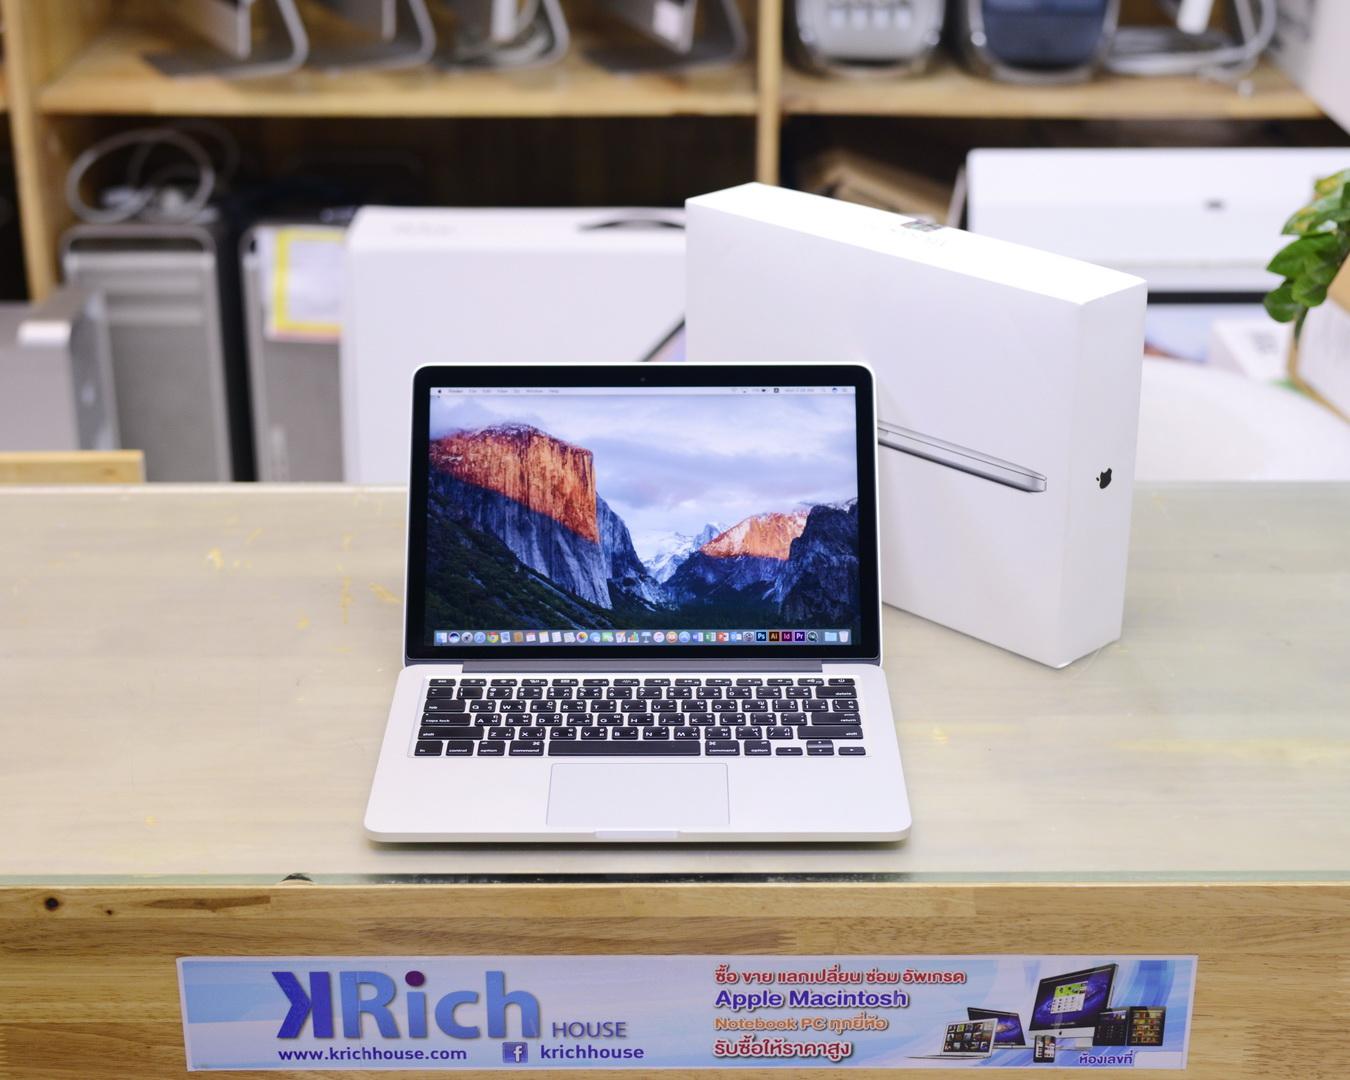 MacBook Pro (Retina 13-inch Early 2015) Core i5 2.7GHz RAM 8GB SSD 256GB - FullBox